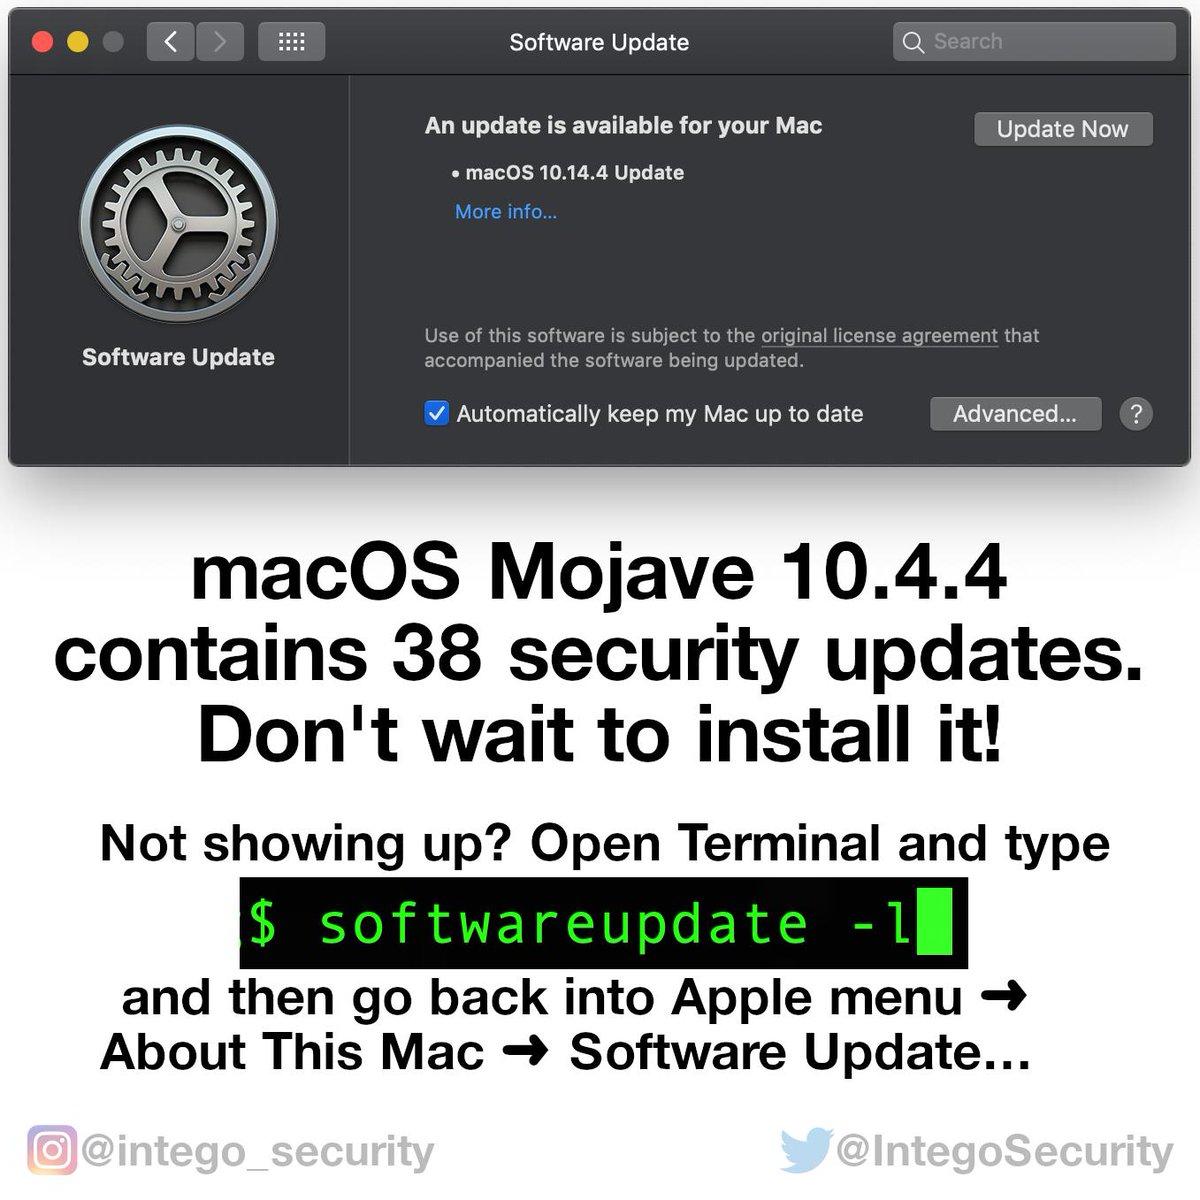 Intego Mac Security on Twitter: